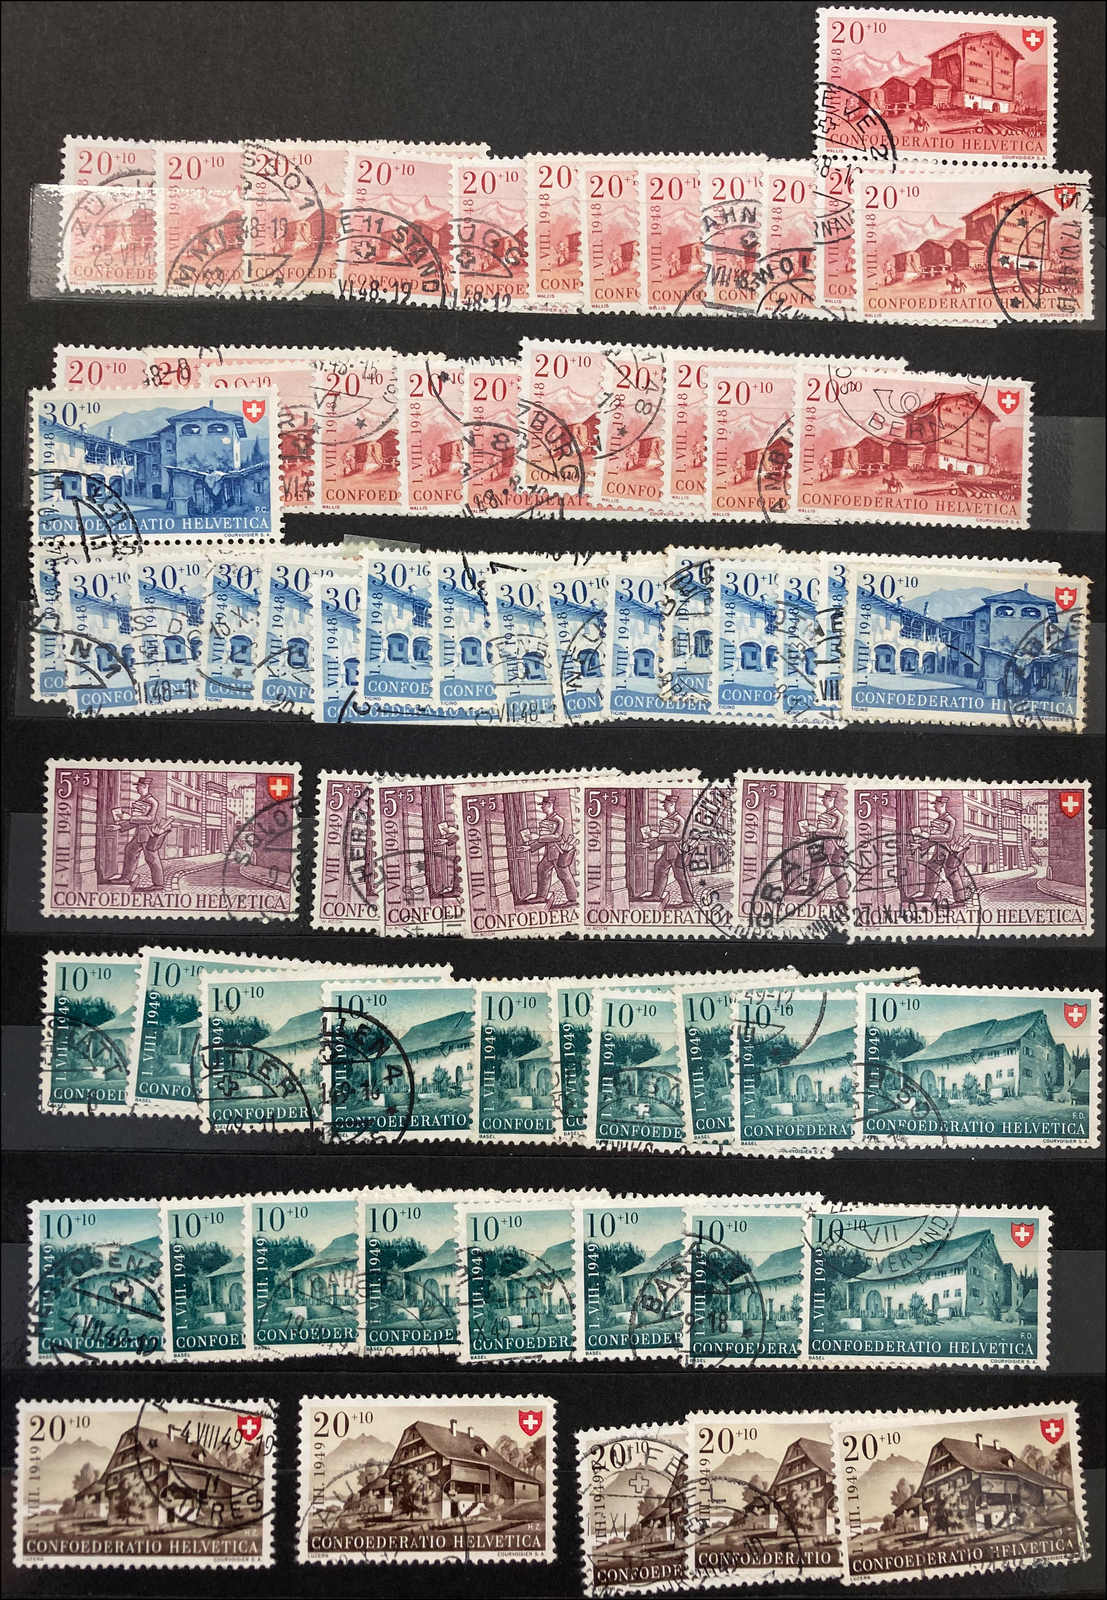 Lot 205 - schweiz schweiz pro patria -  Rolli Auctions Auction #68 Day 1